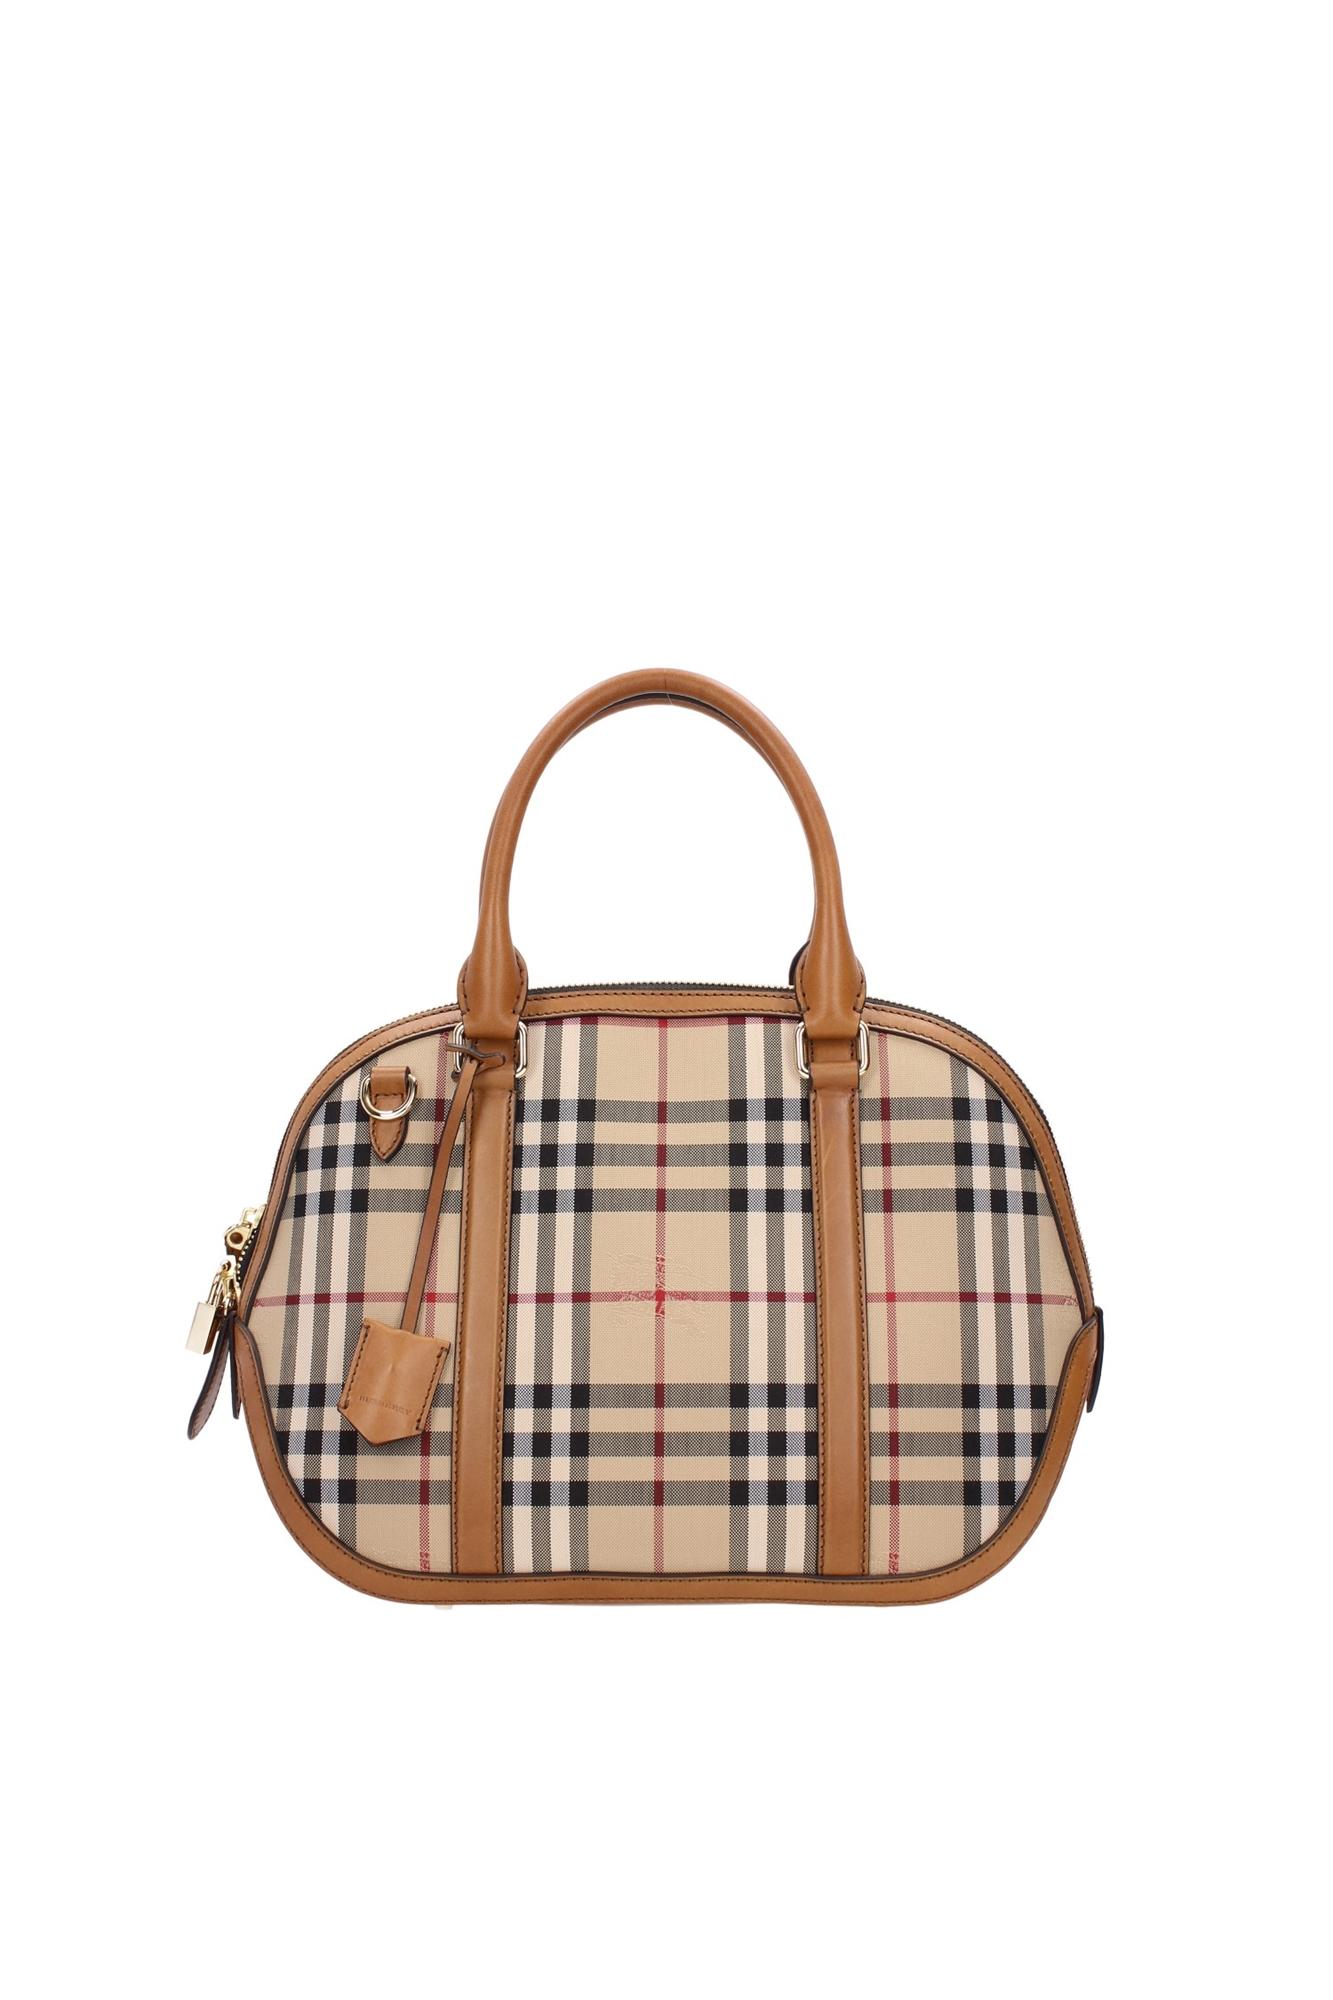 Hand Bags Burberry Women Polyamide Brown 3939335 | eBay